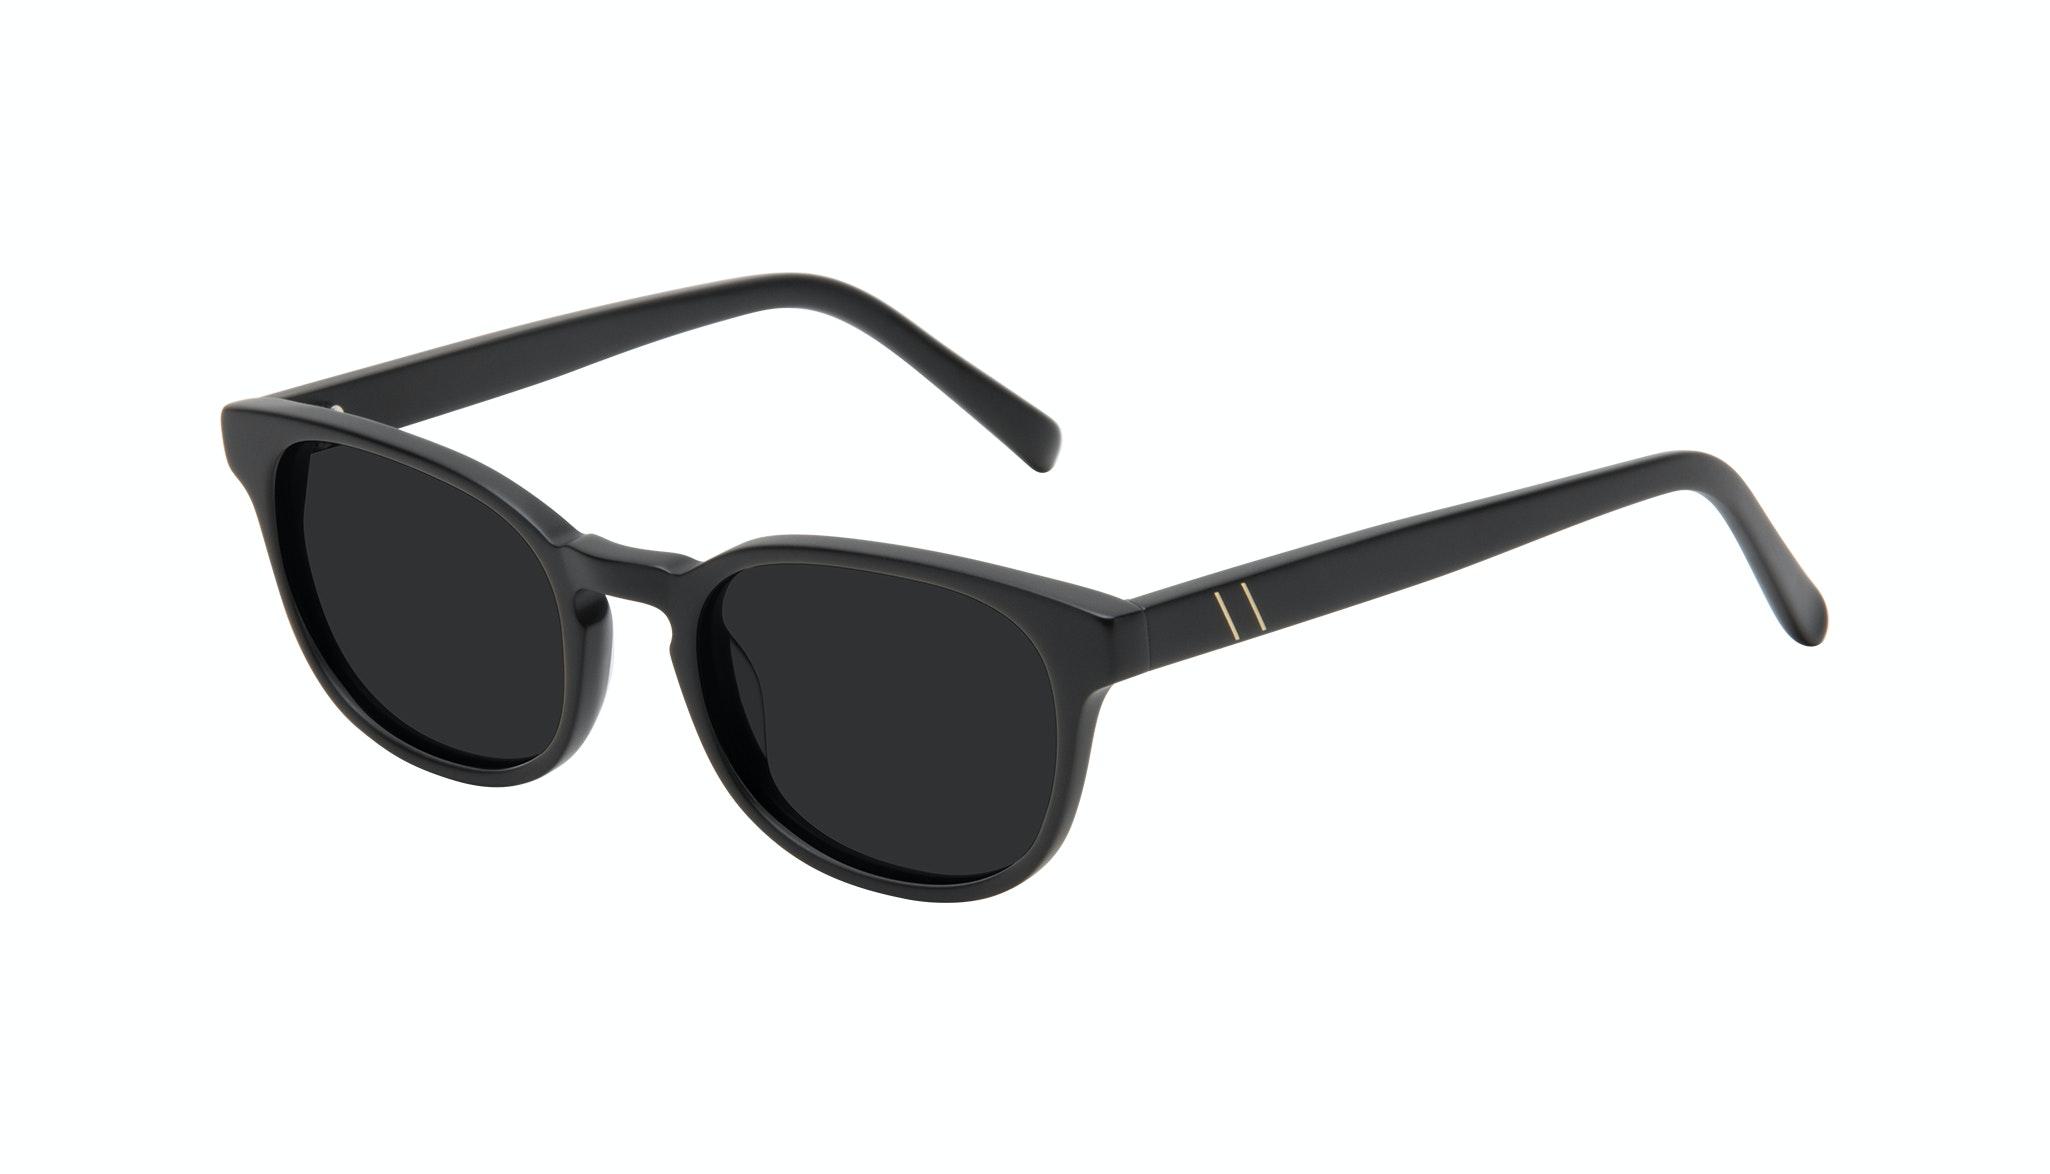 Affordable Fashion Glasses Square Sunglasses Men Essence Black Matte Tilt